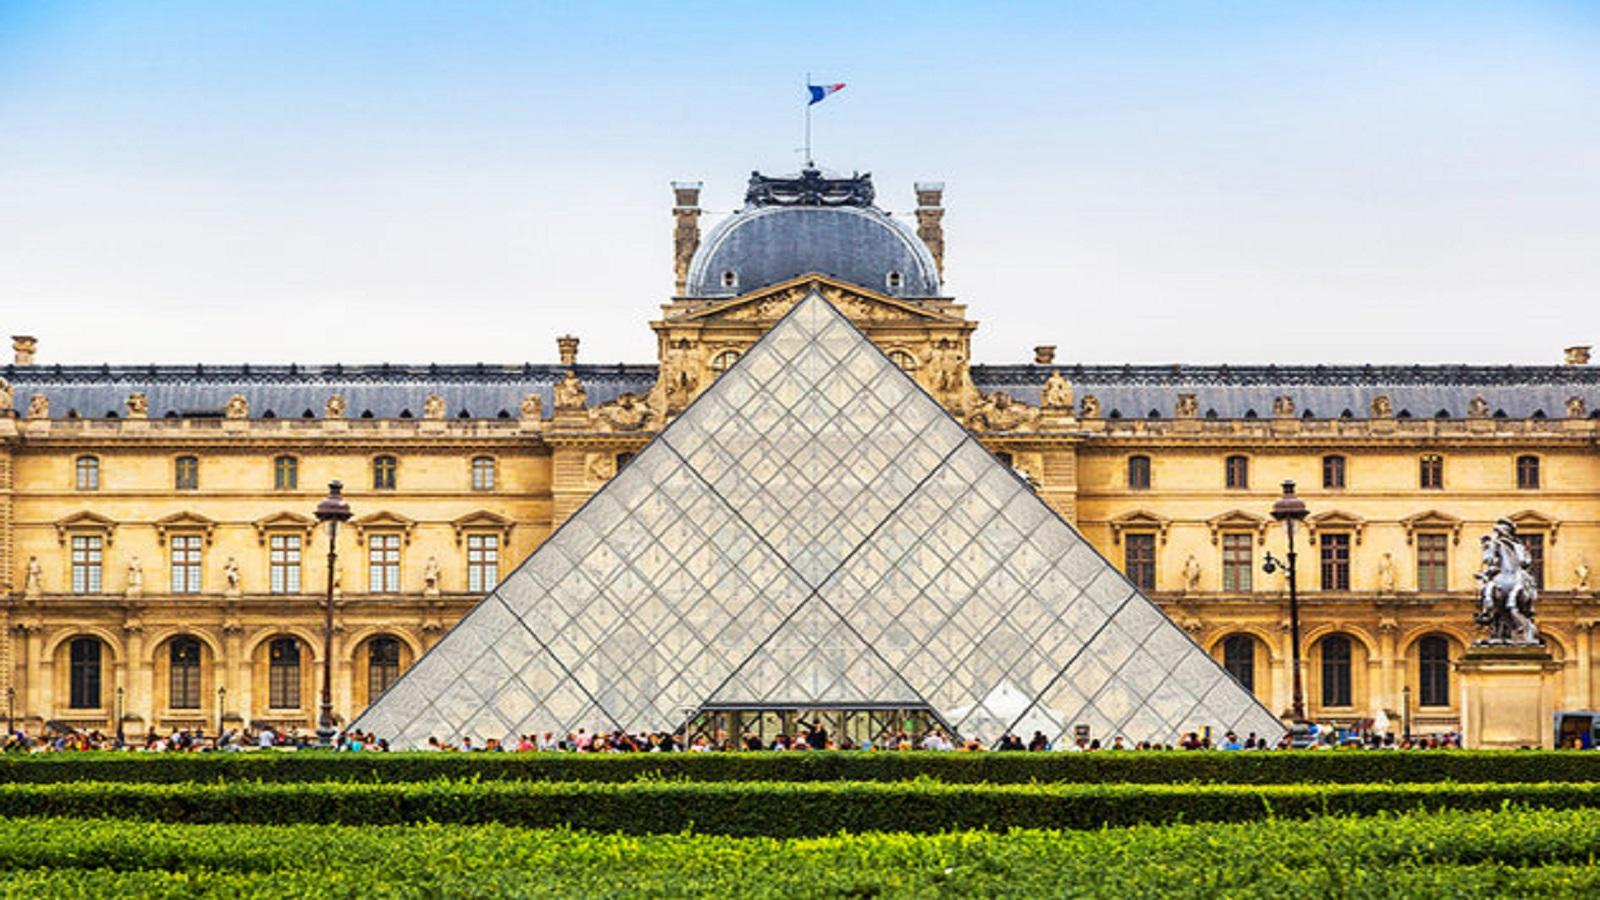 Chemistry 2018 - Paris ,France